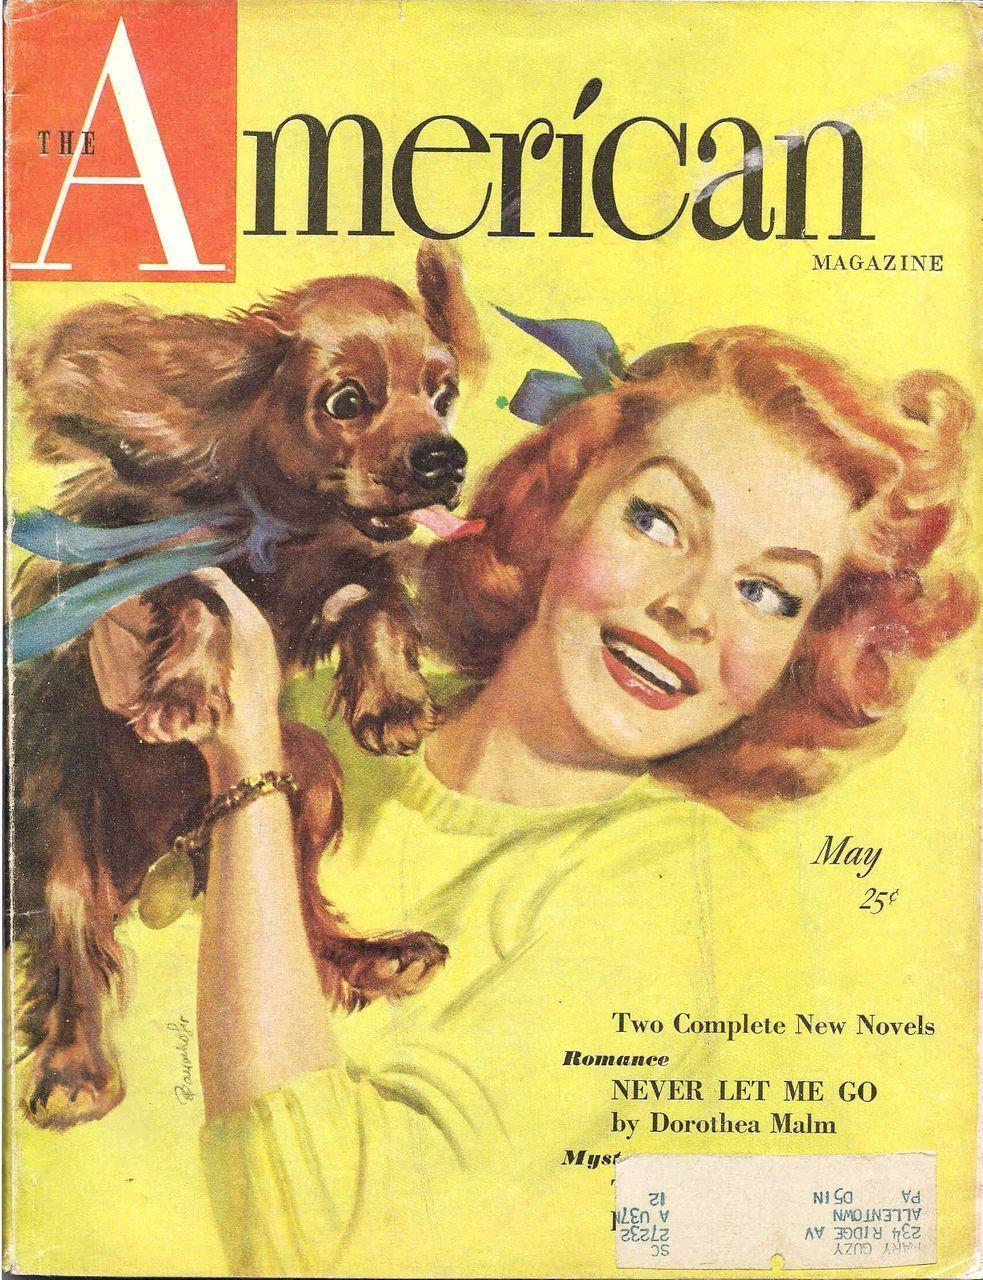 American art loving pup vintage original magazine cover